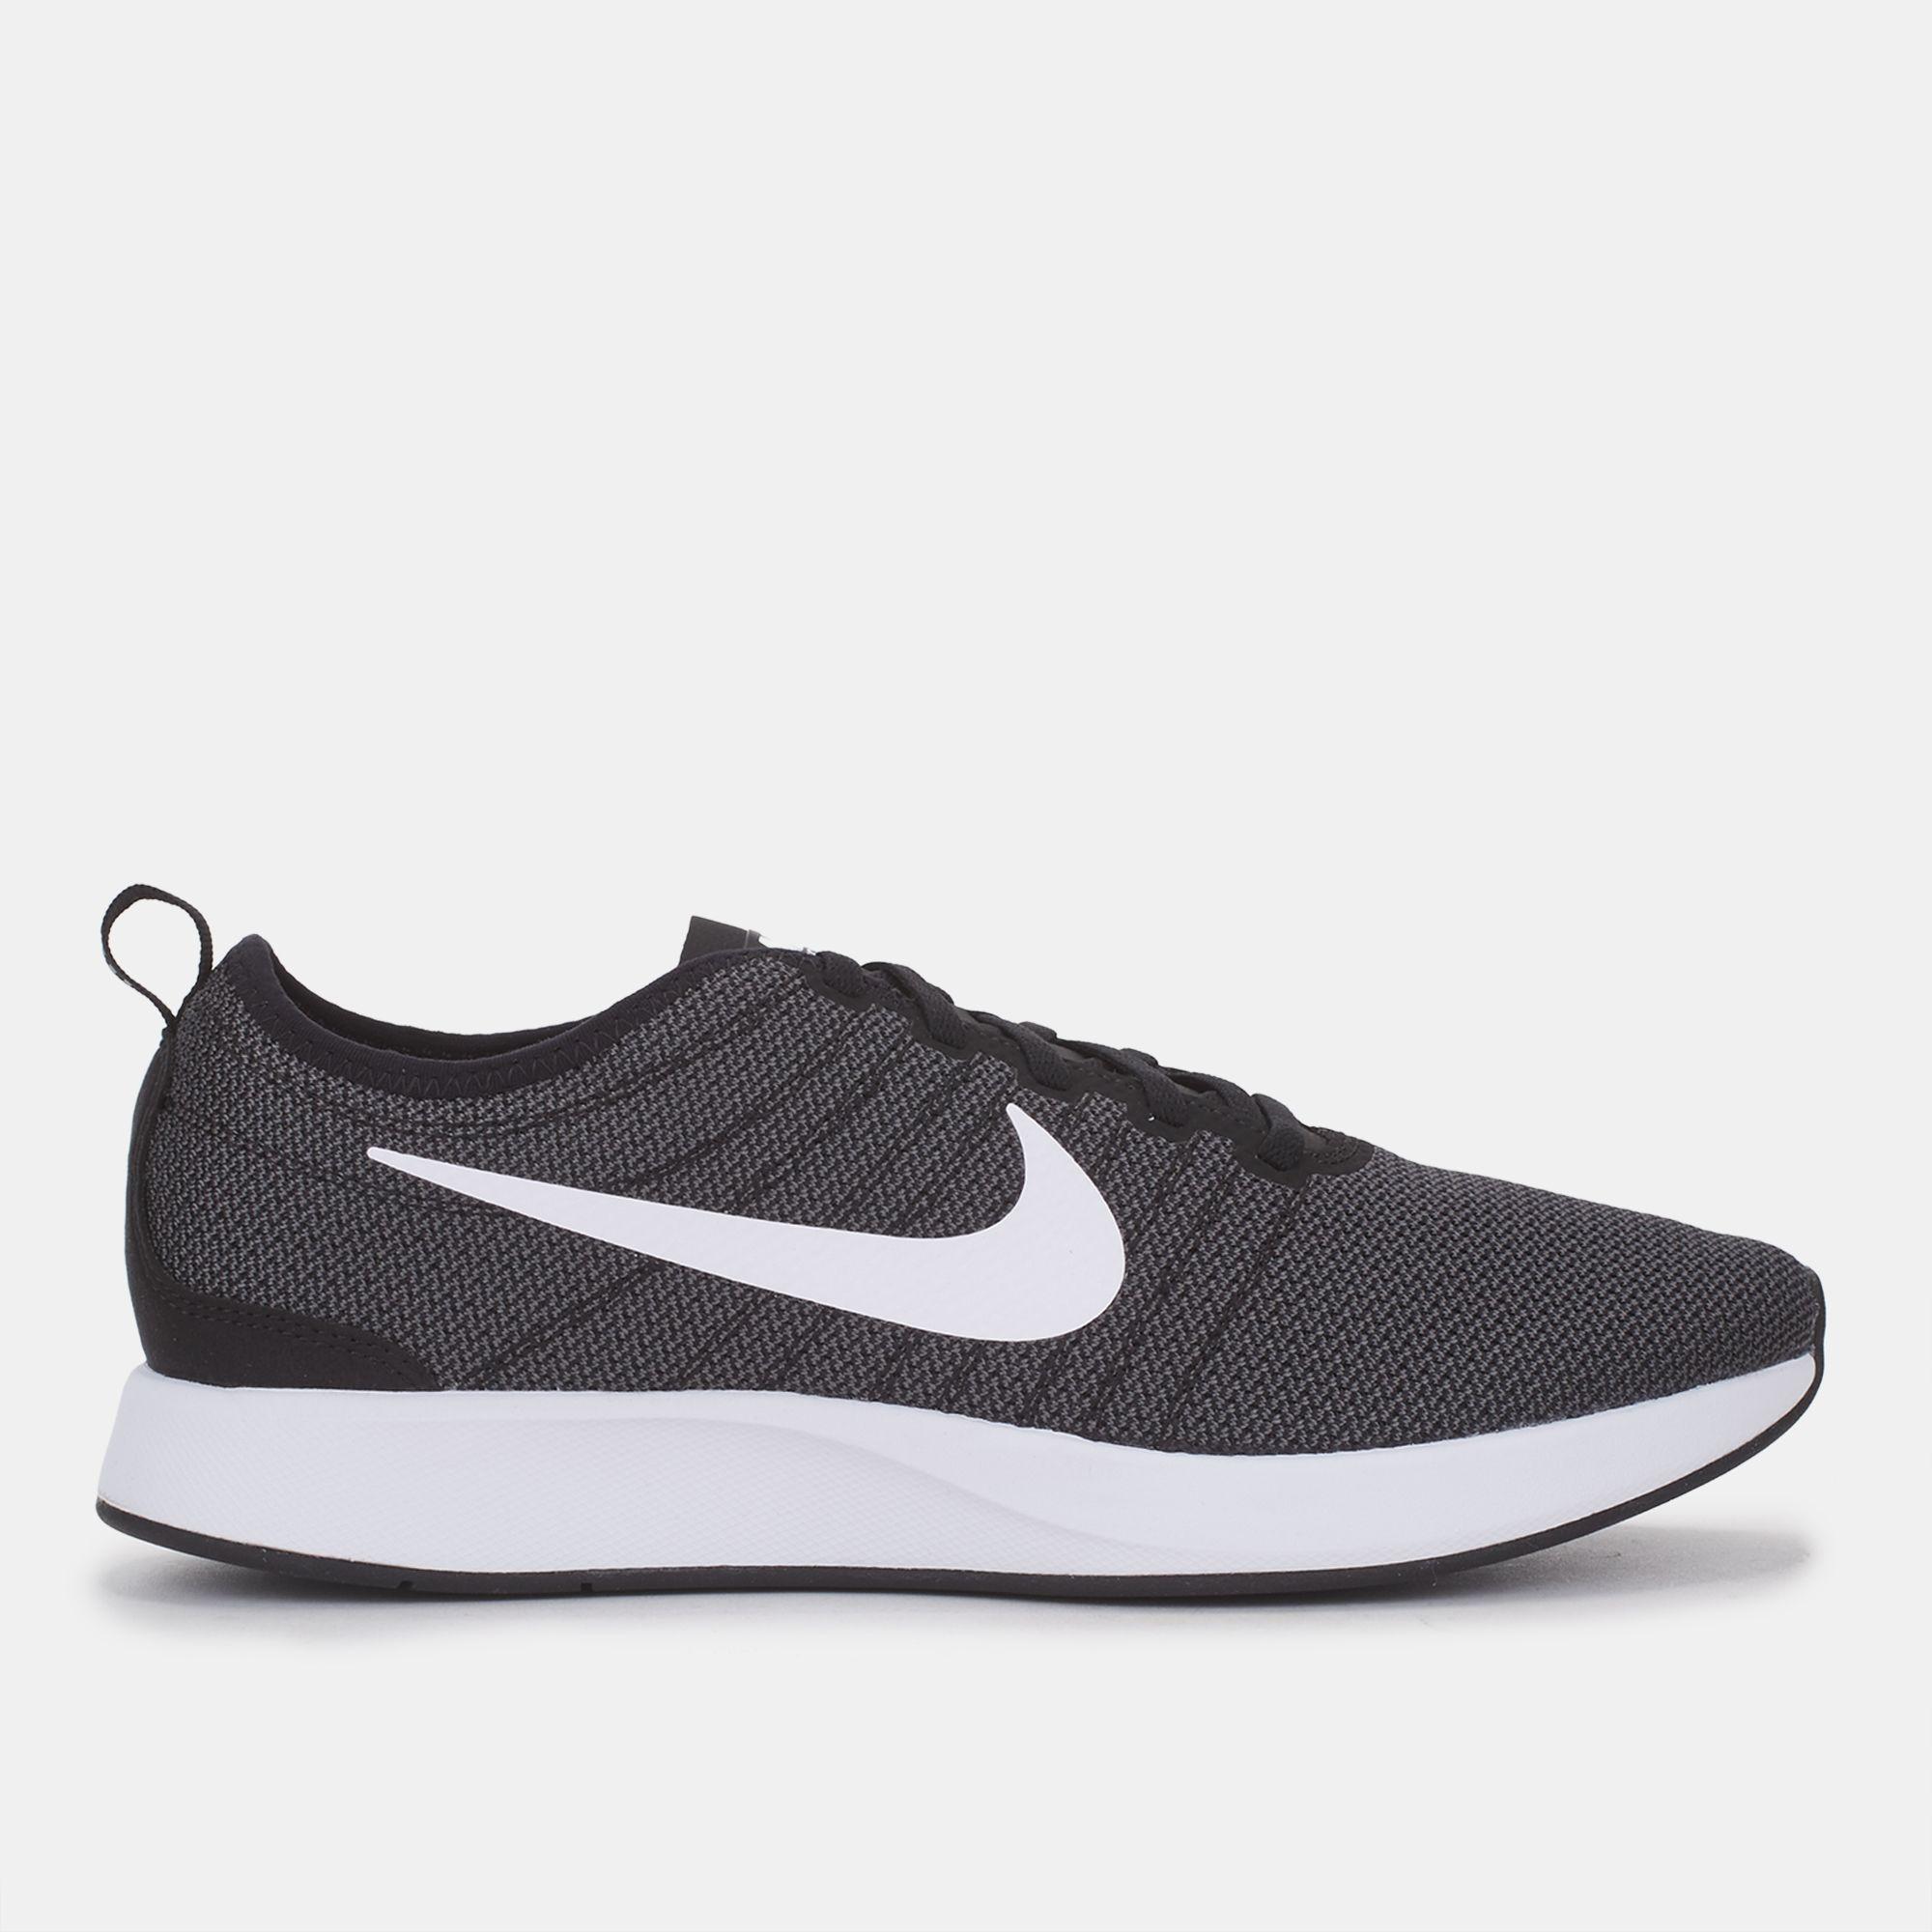 3411be424629 Shop Black Nike DualTone Racer Running Shoe for Mens by Nike